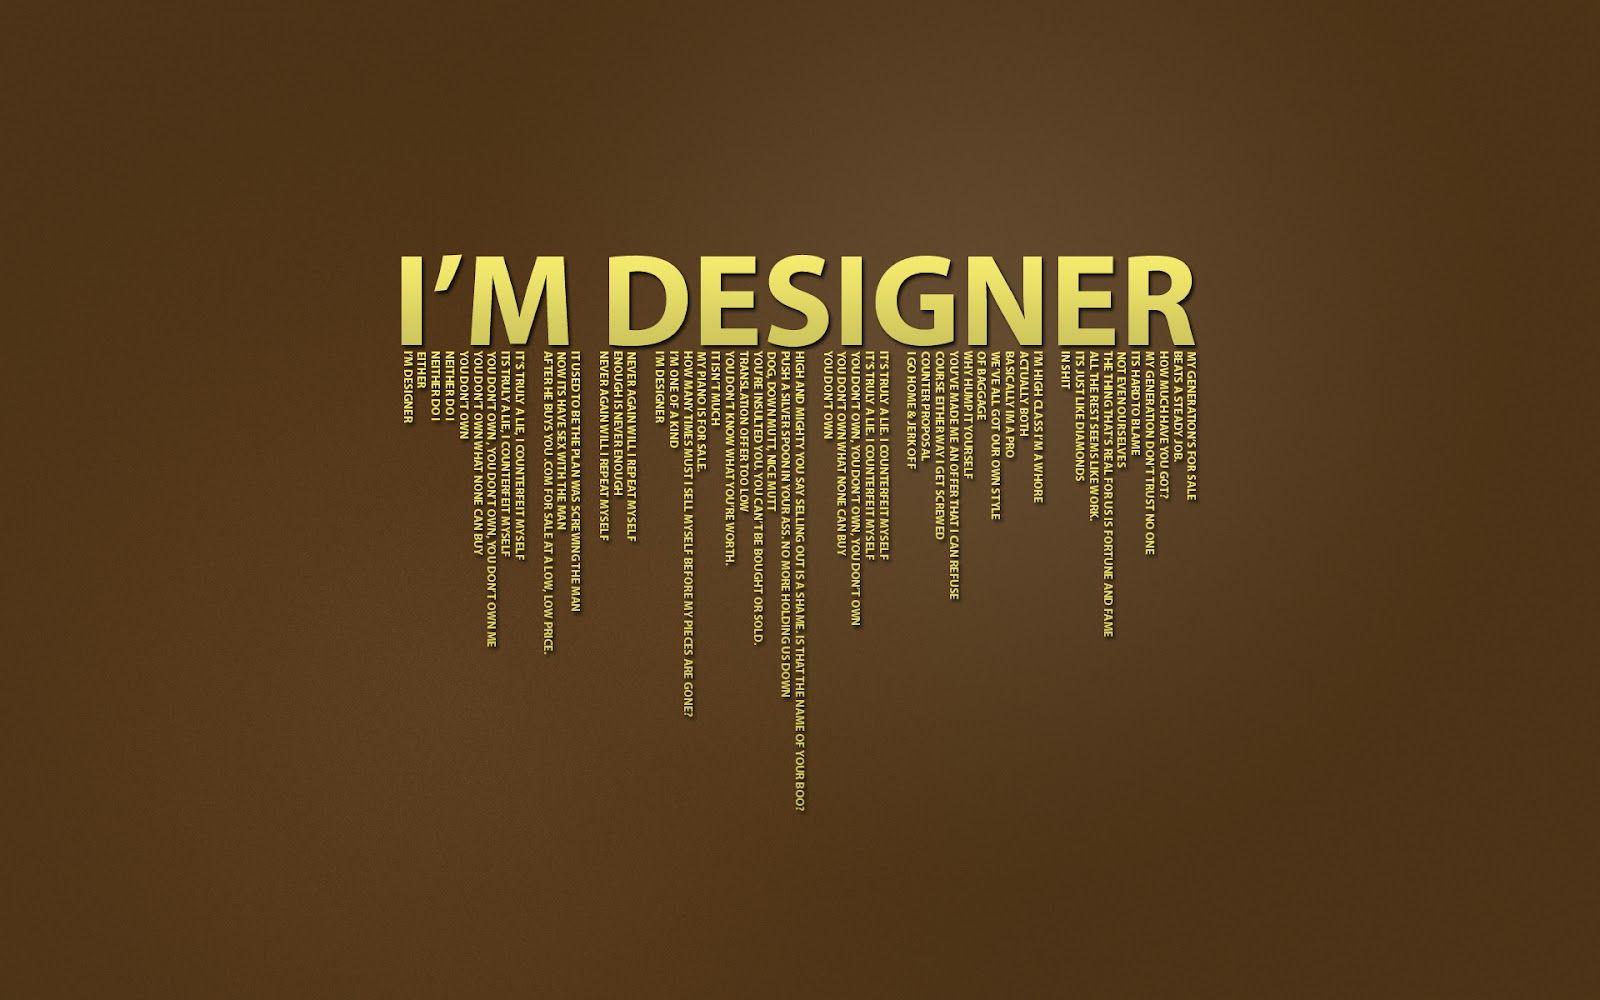 laugh design casar tbcct co